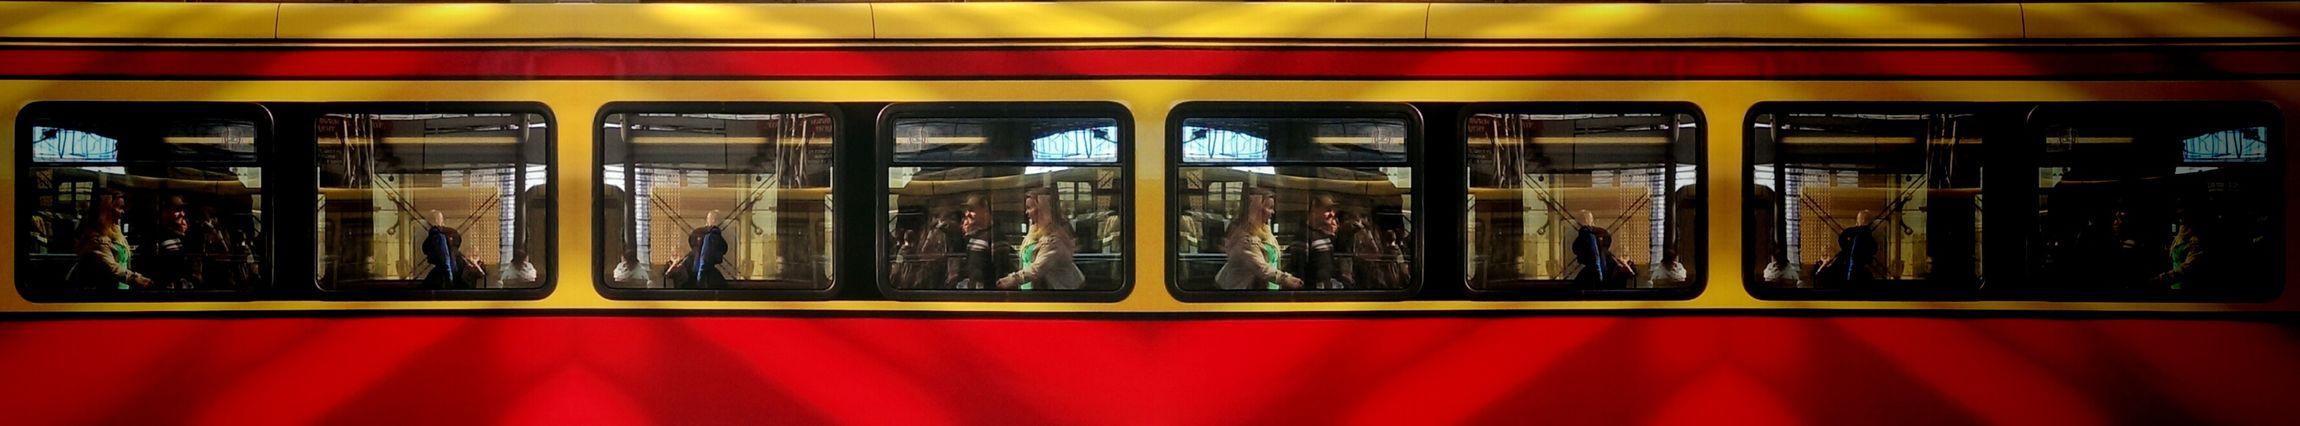 where are all the doors? Train People Urban Geometry Berlin